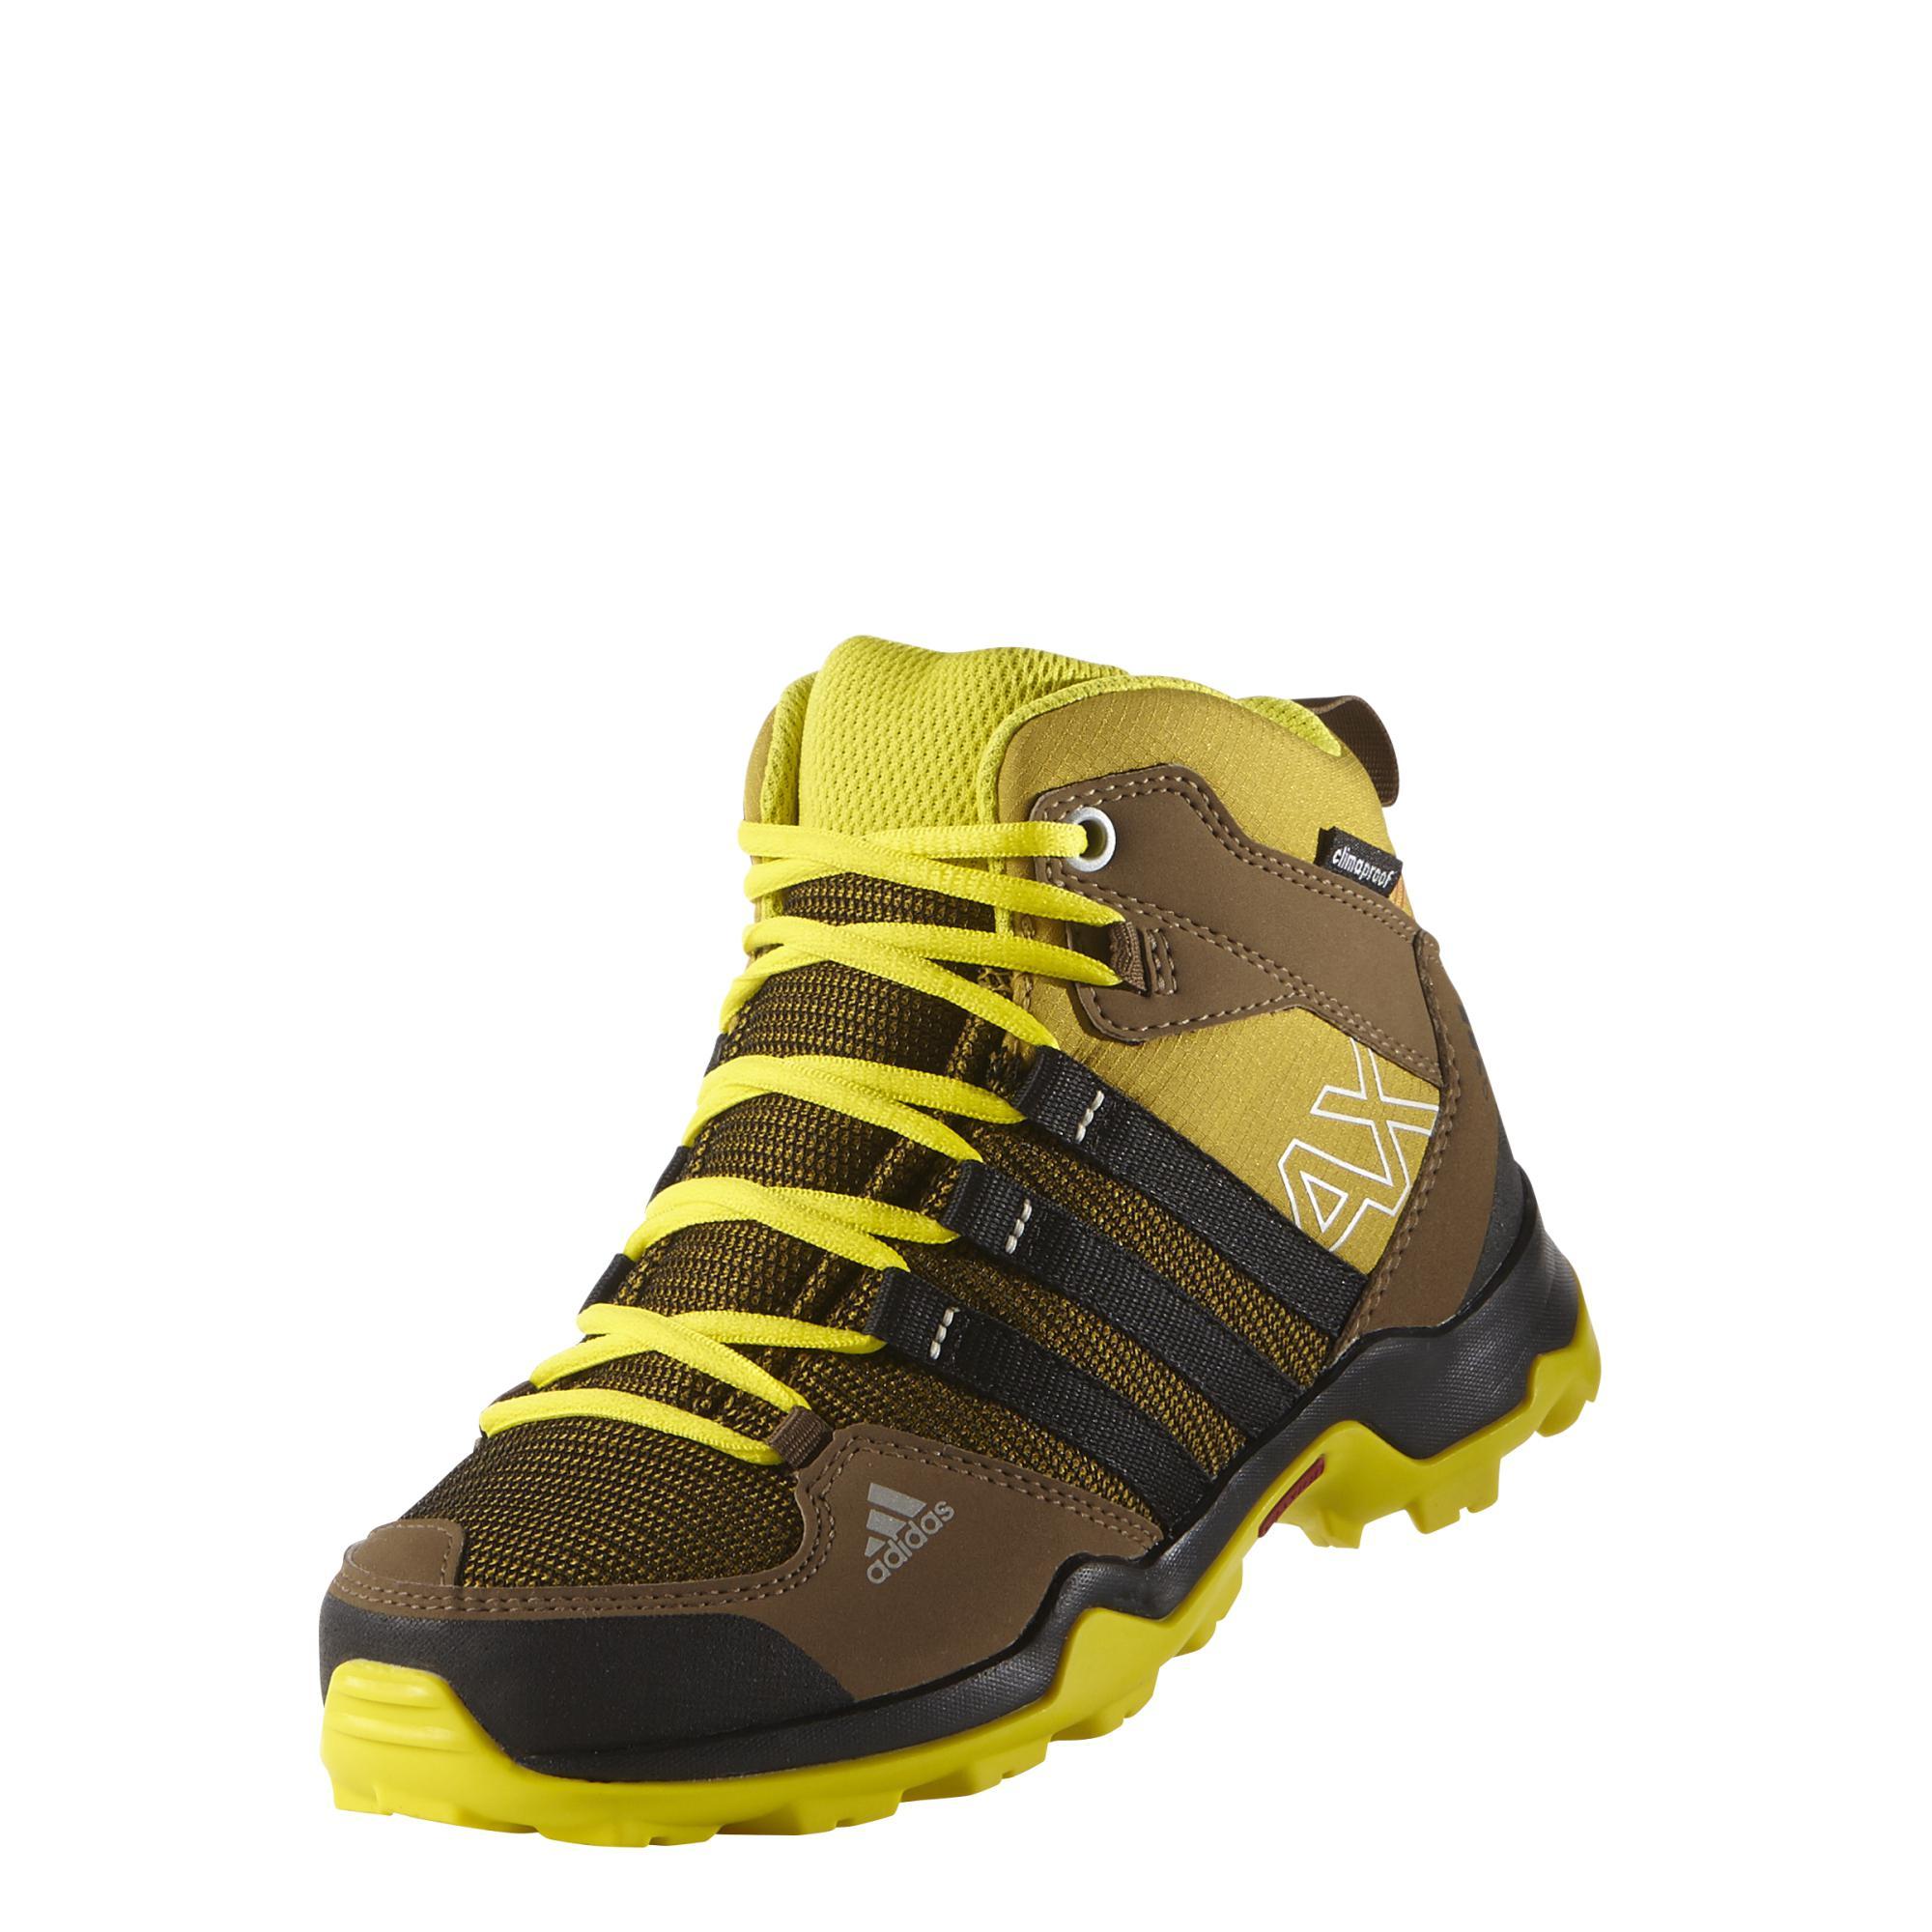 check out f2588 43794 27dc3 ac9c9  uk adidas ax2 mid cp kids ocre negro amarillo e442c e3110